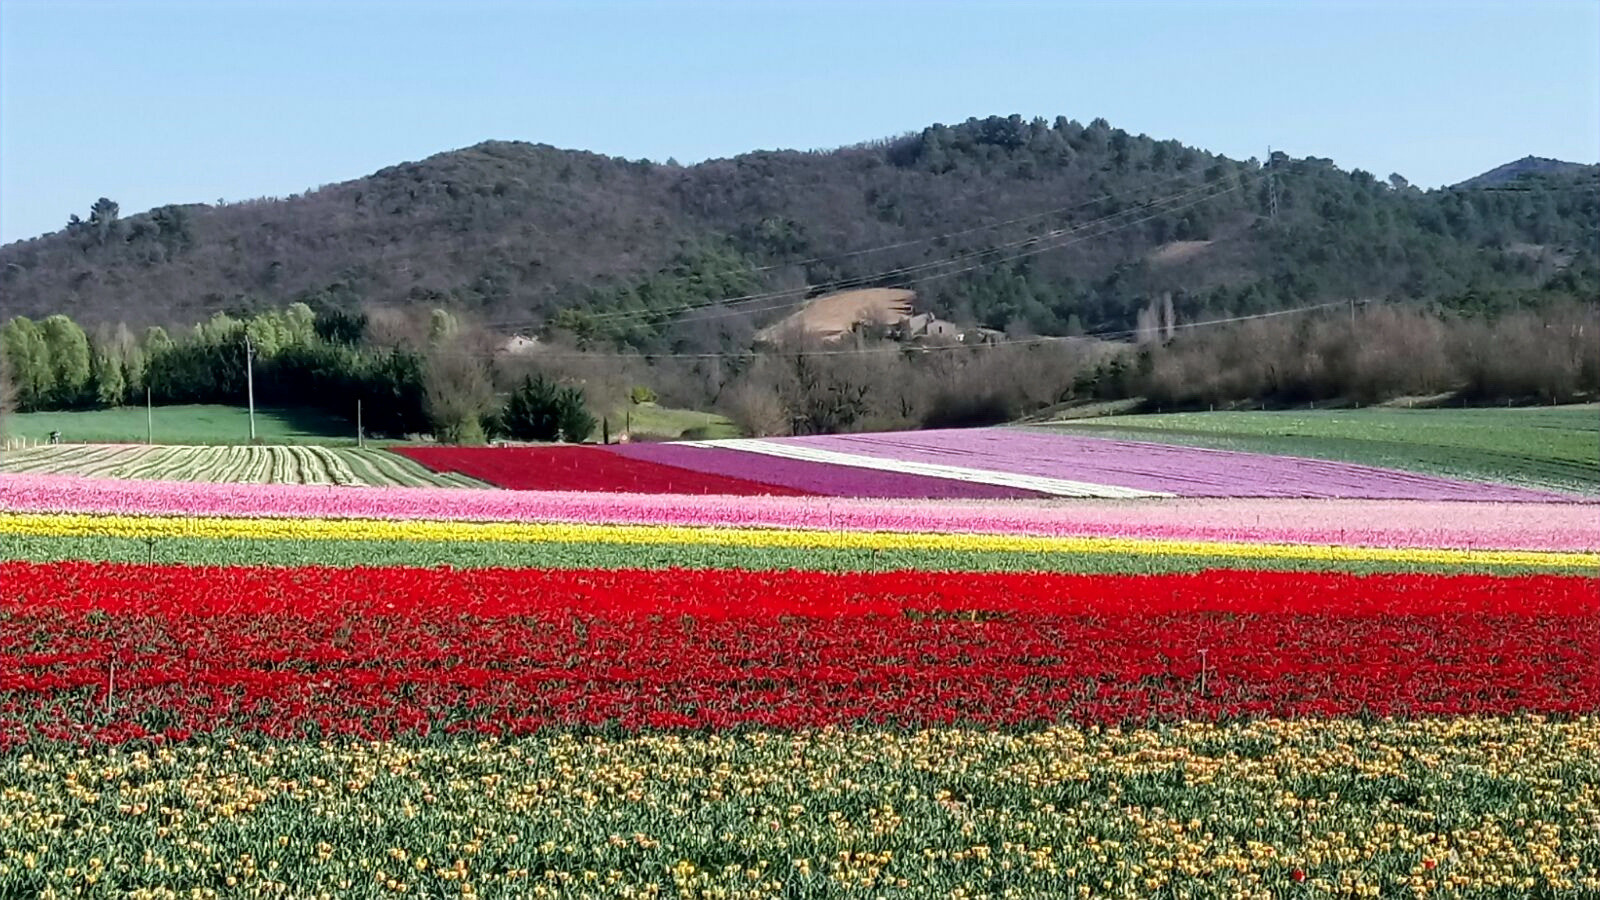 Tulipes en mars-avril